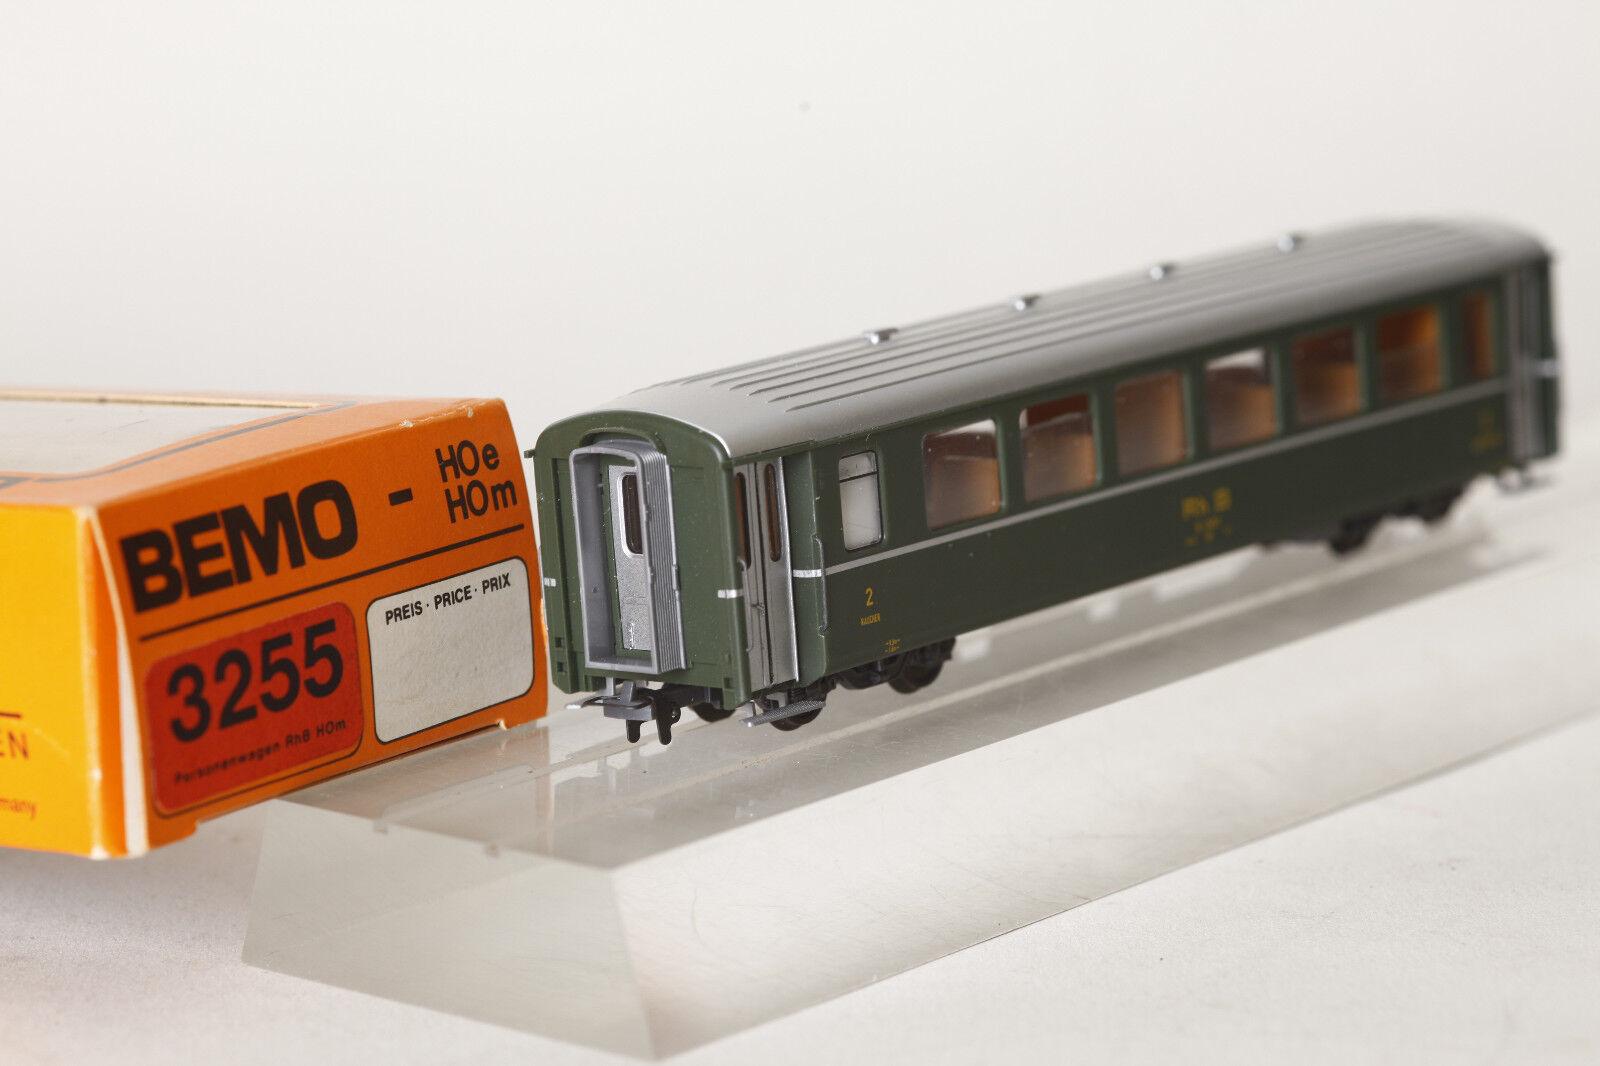 Bemo H0m 3255 111 Carroza Rh B Ferrovia Retica B 2451 2.kl. Verde  72134